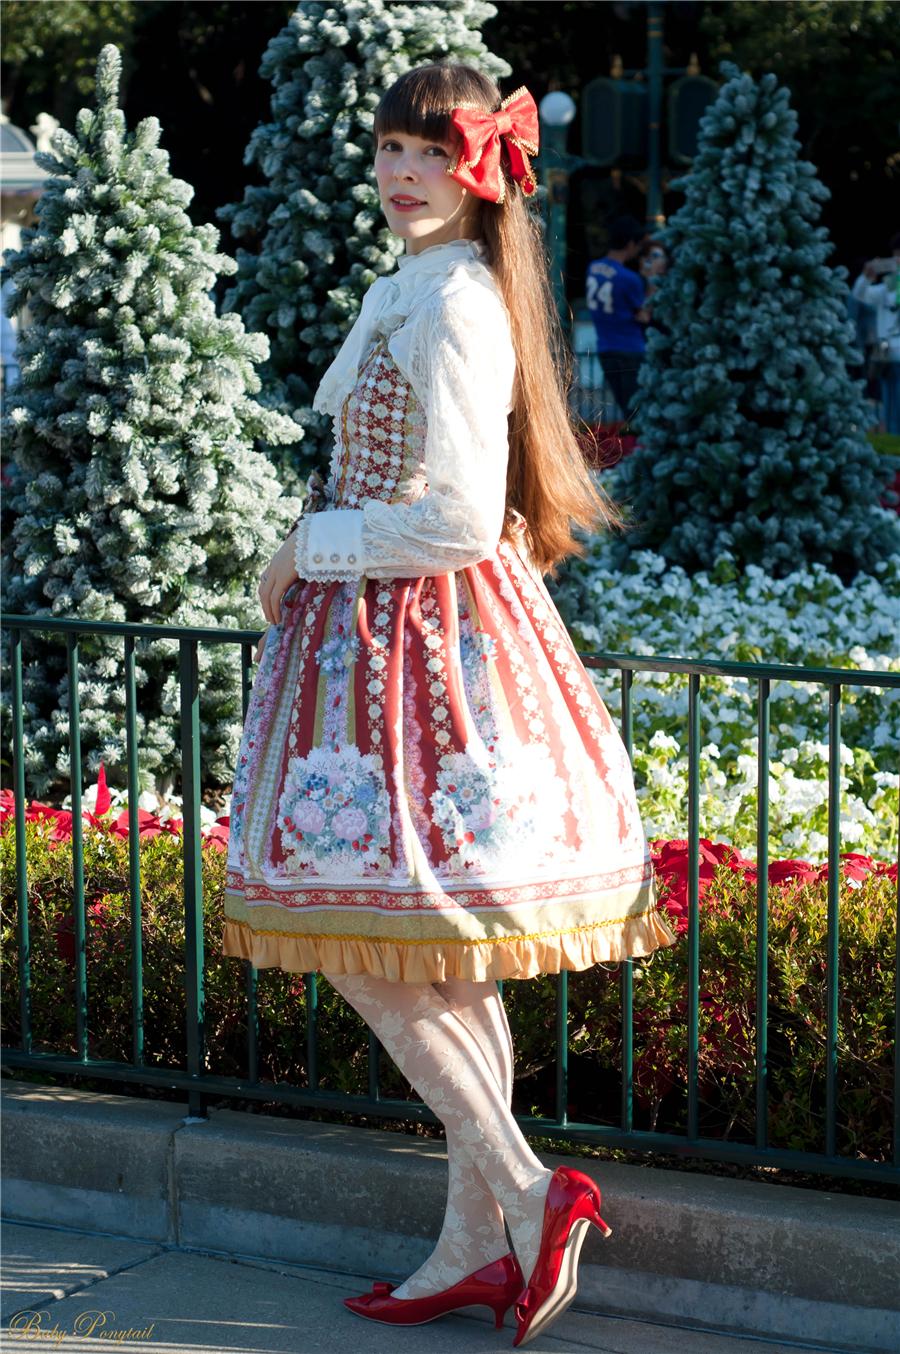 Baby Ponytail_Model Photo_Polly's Garden of Dreams_JSK Red_Claudia_10.jpg